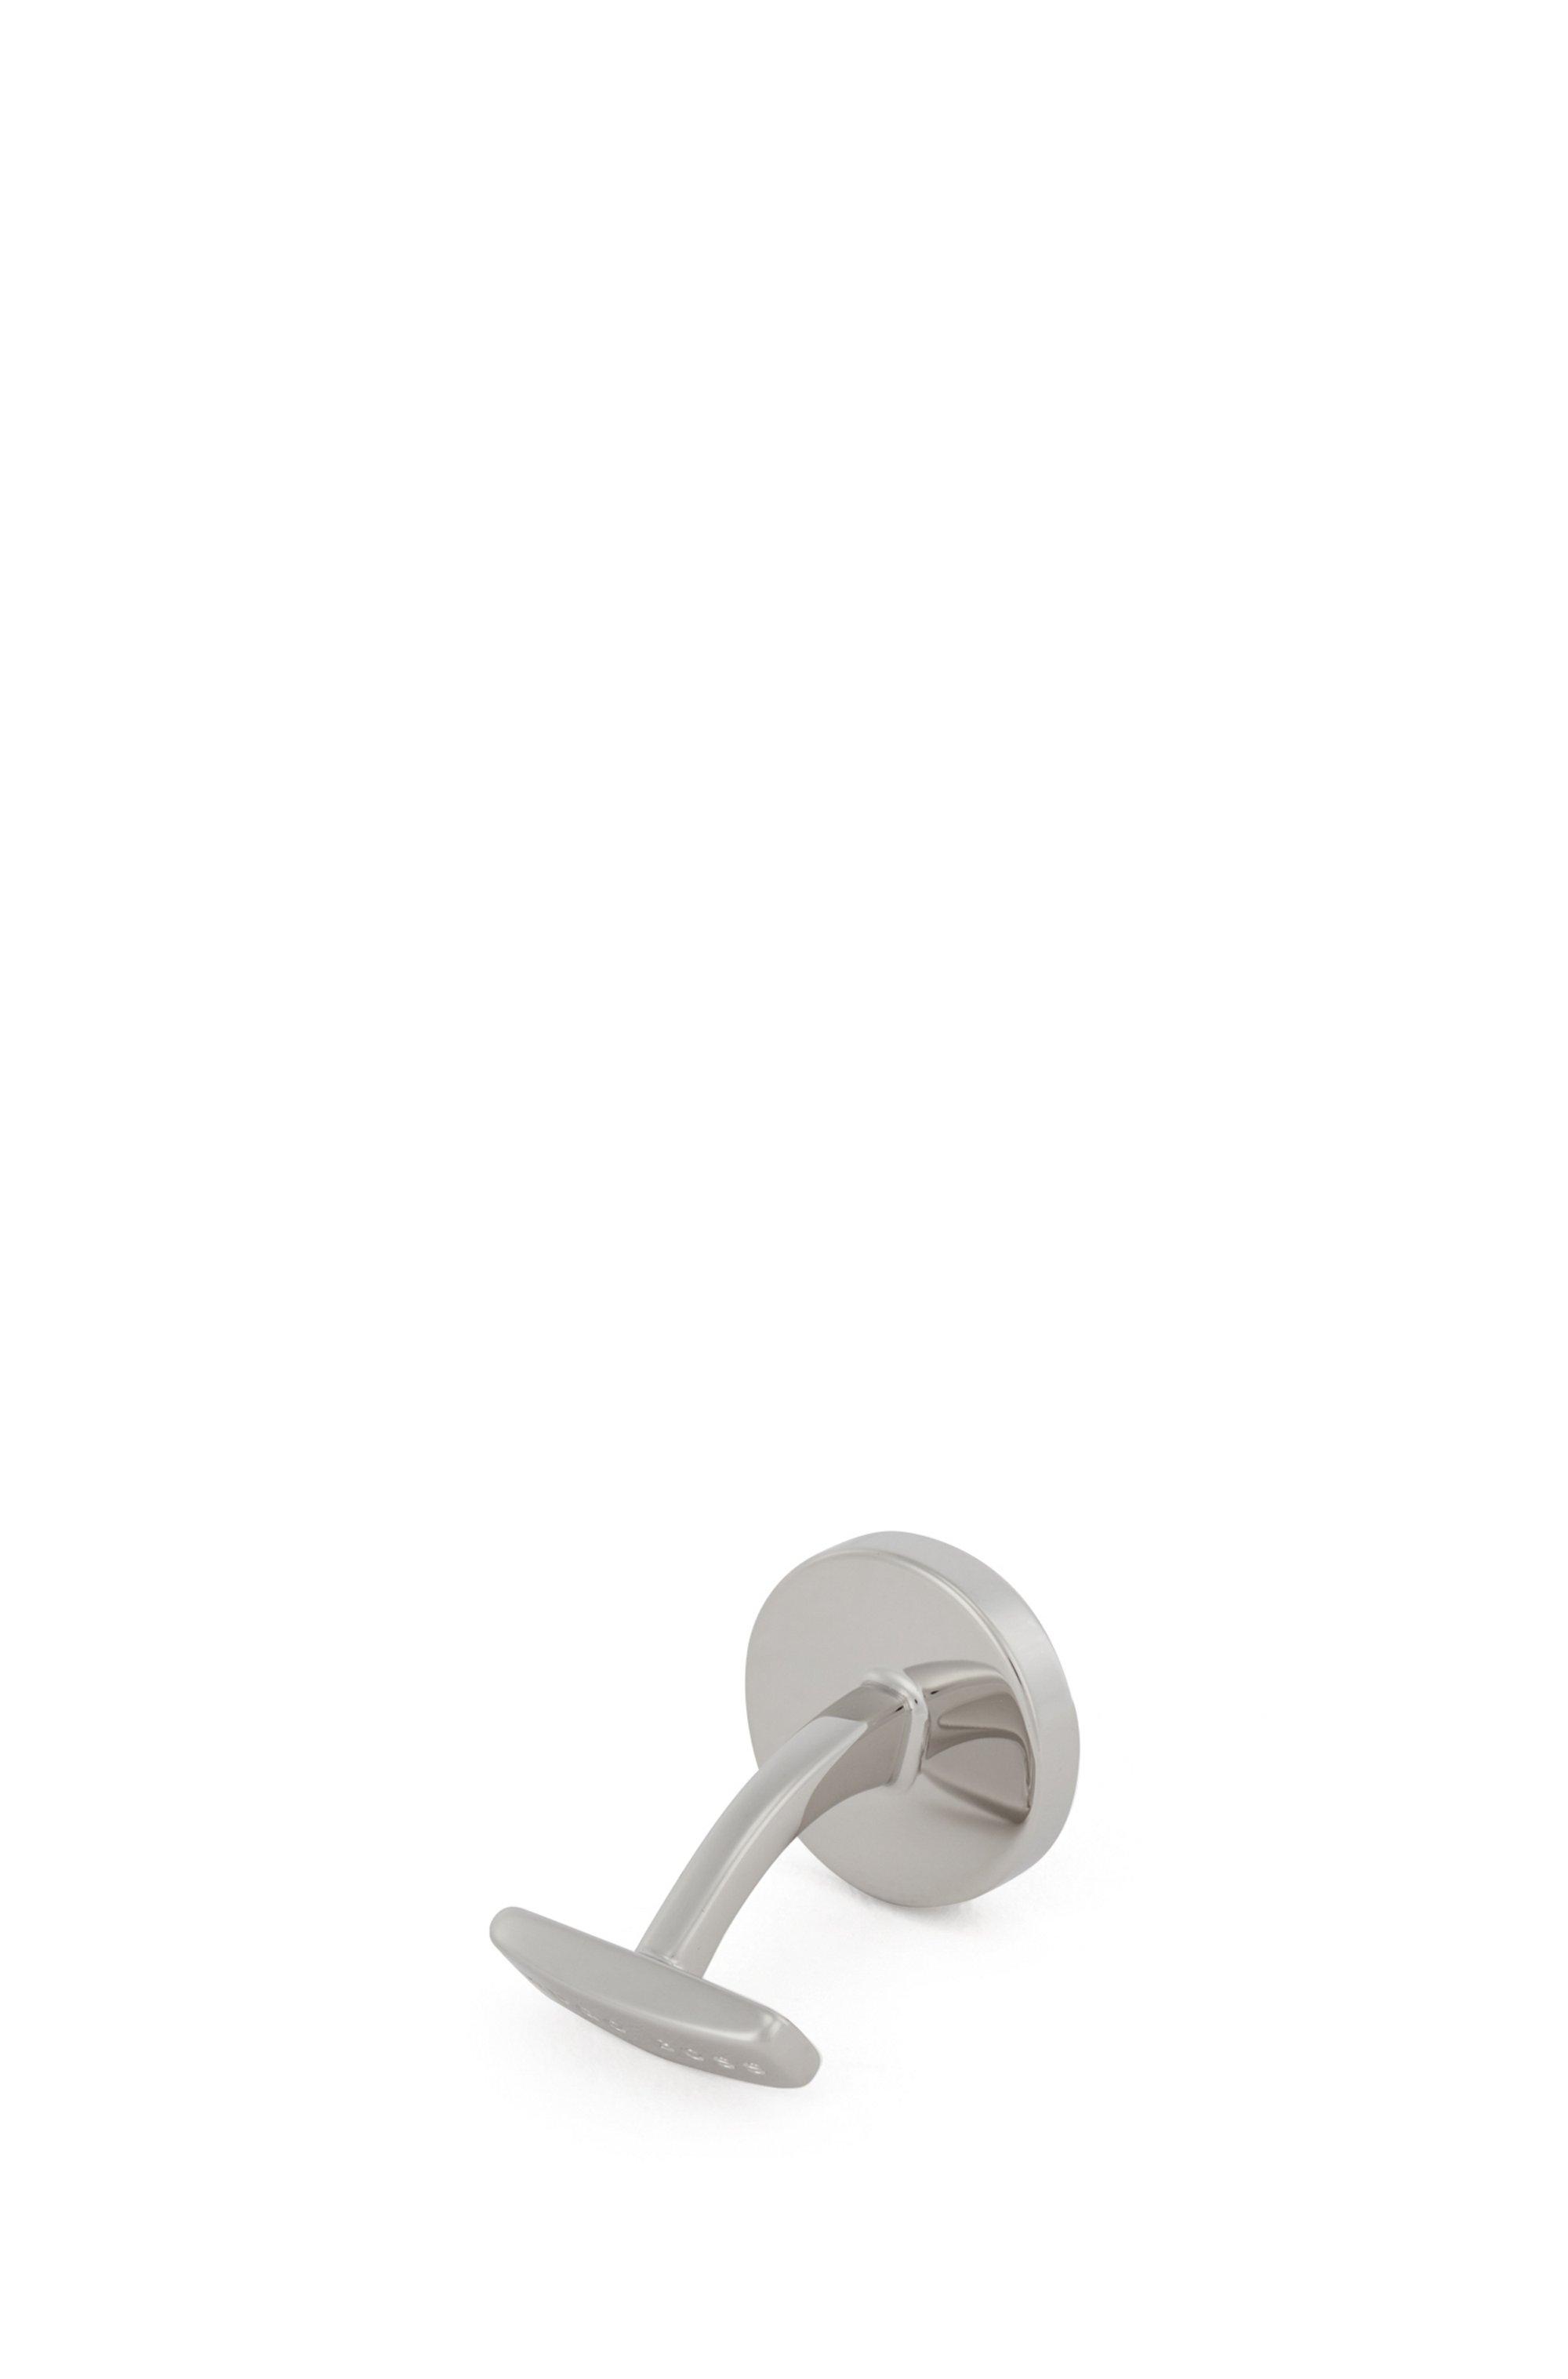 Round cufflinks with enamel core